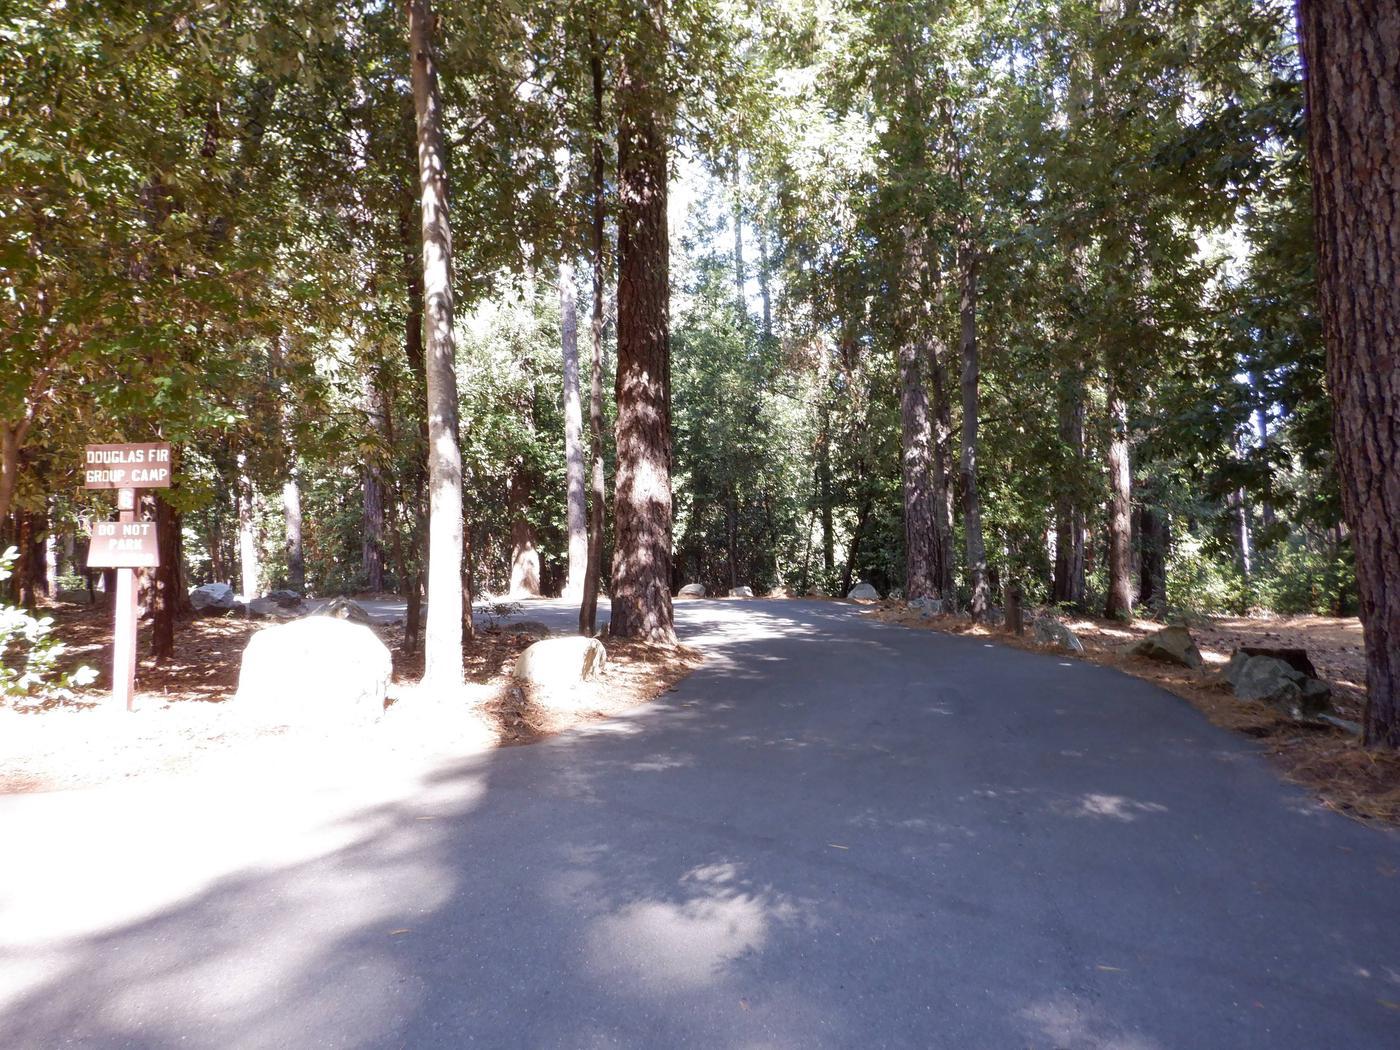 Entrance to Douglas Fir Campsite